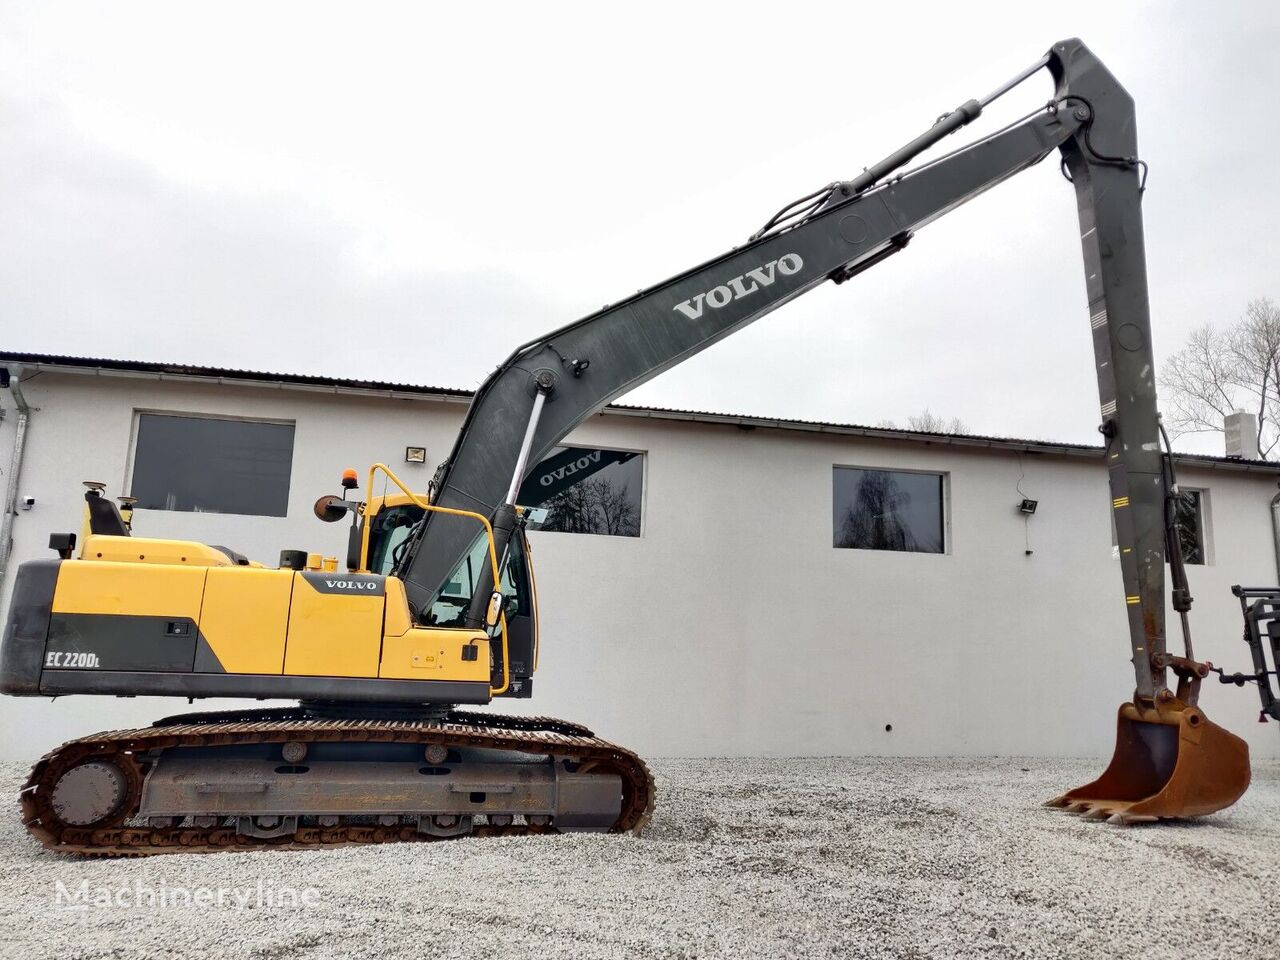 VOLVO-ABG EC 220 DL Long Reach Leica 3D-Nivellierung tracked excavator